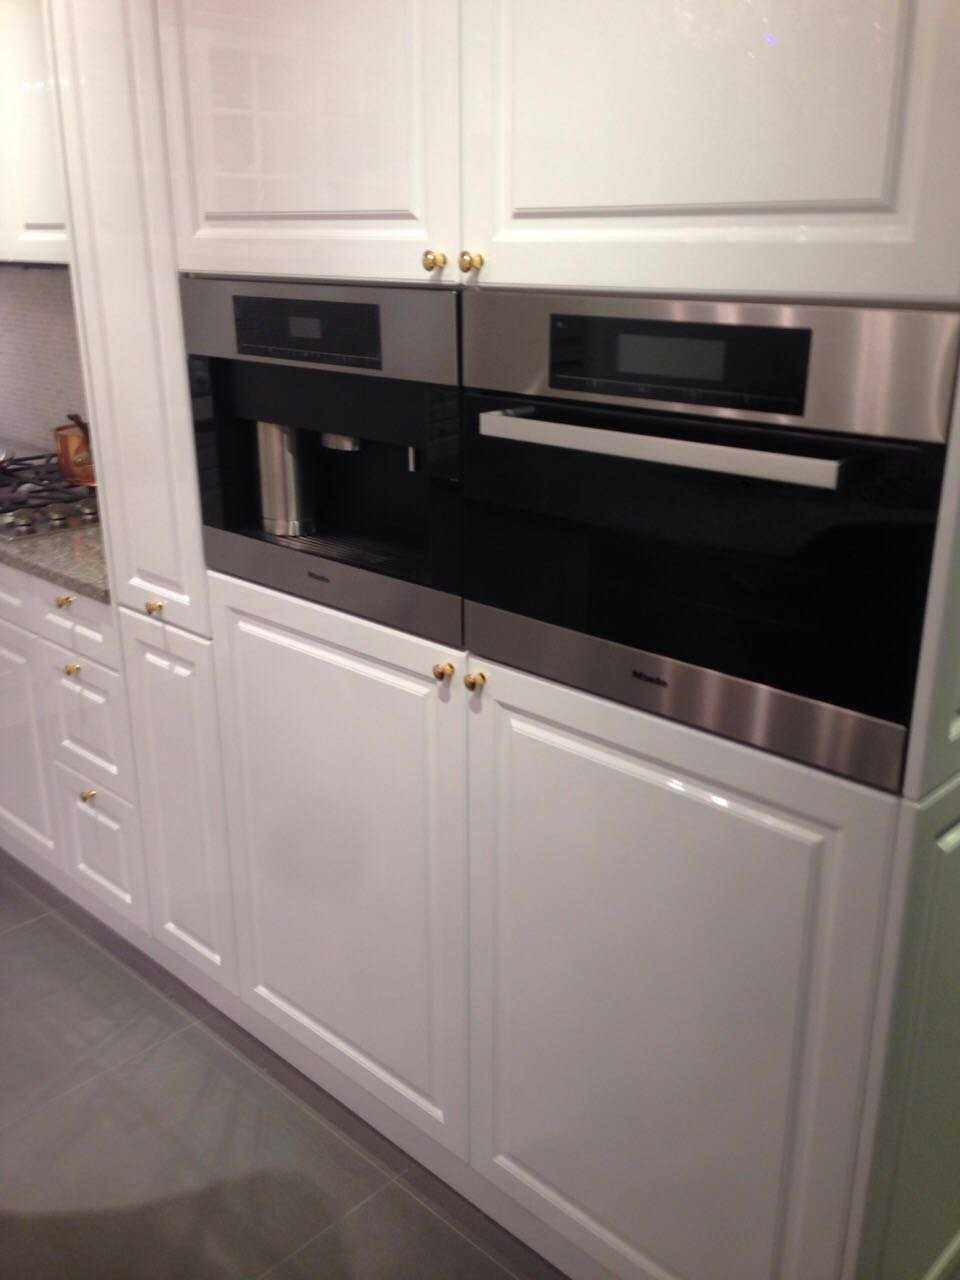 kitchen aid wall oven blackboard 眼界 收藏夹 知乎 厨房援助墙烤箱